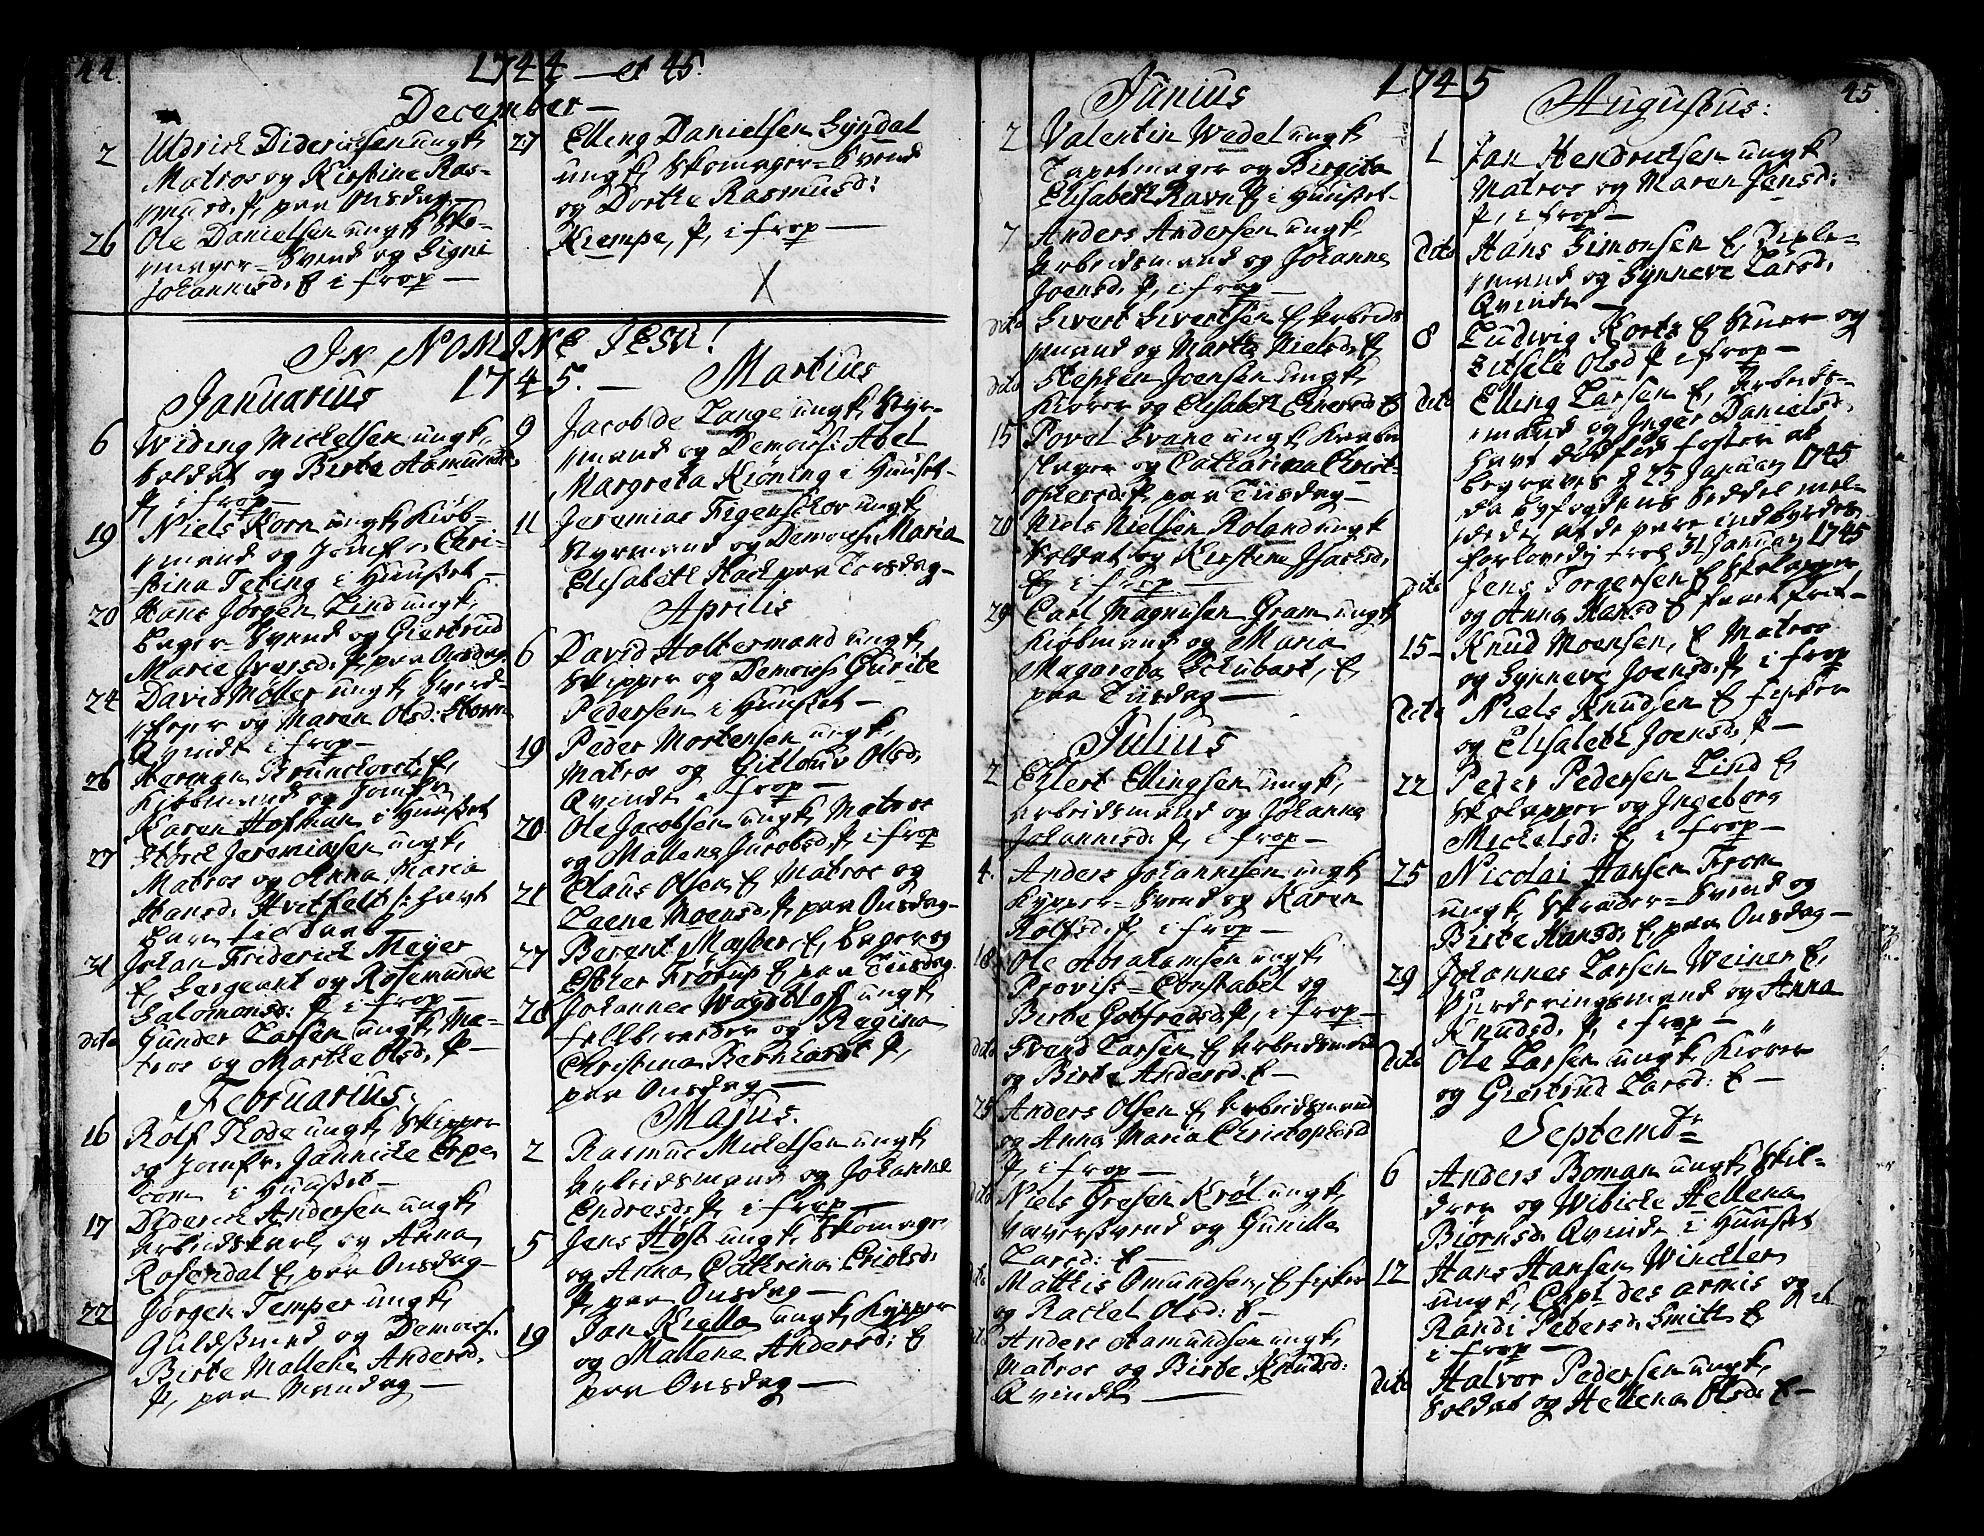 SAB, Domkirken sokneprestembete, H/Haa/L0007: Ministerialbok nr. A 7, 1725-1826, s. 44-45